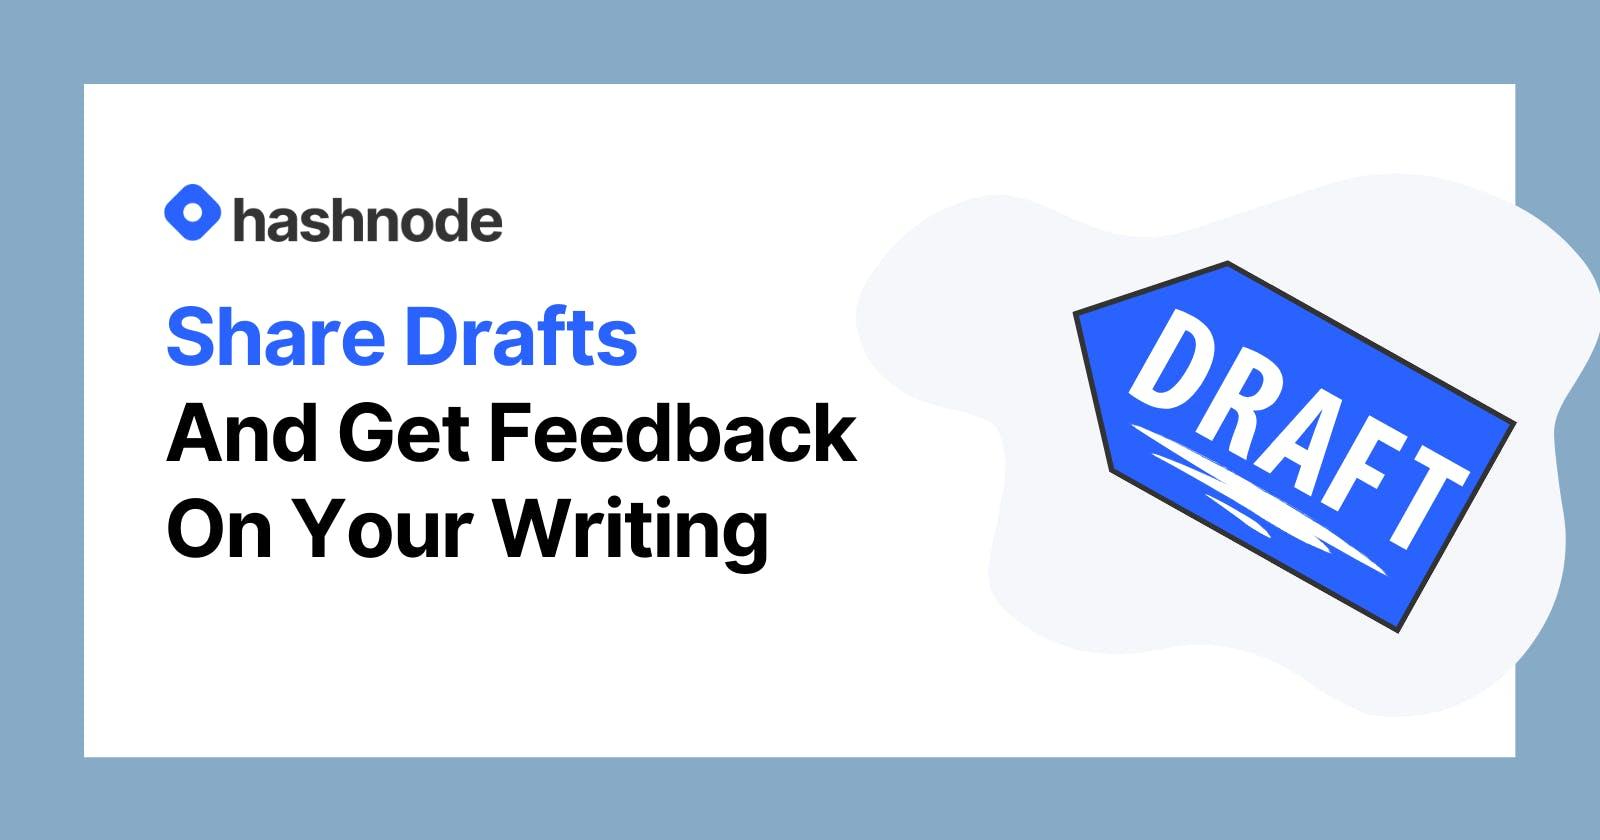 Hashnode Share Draft Feature - Write Better Articles